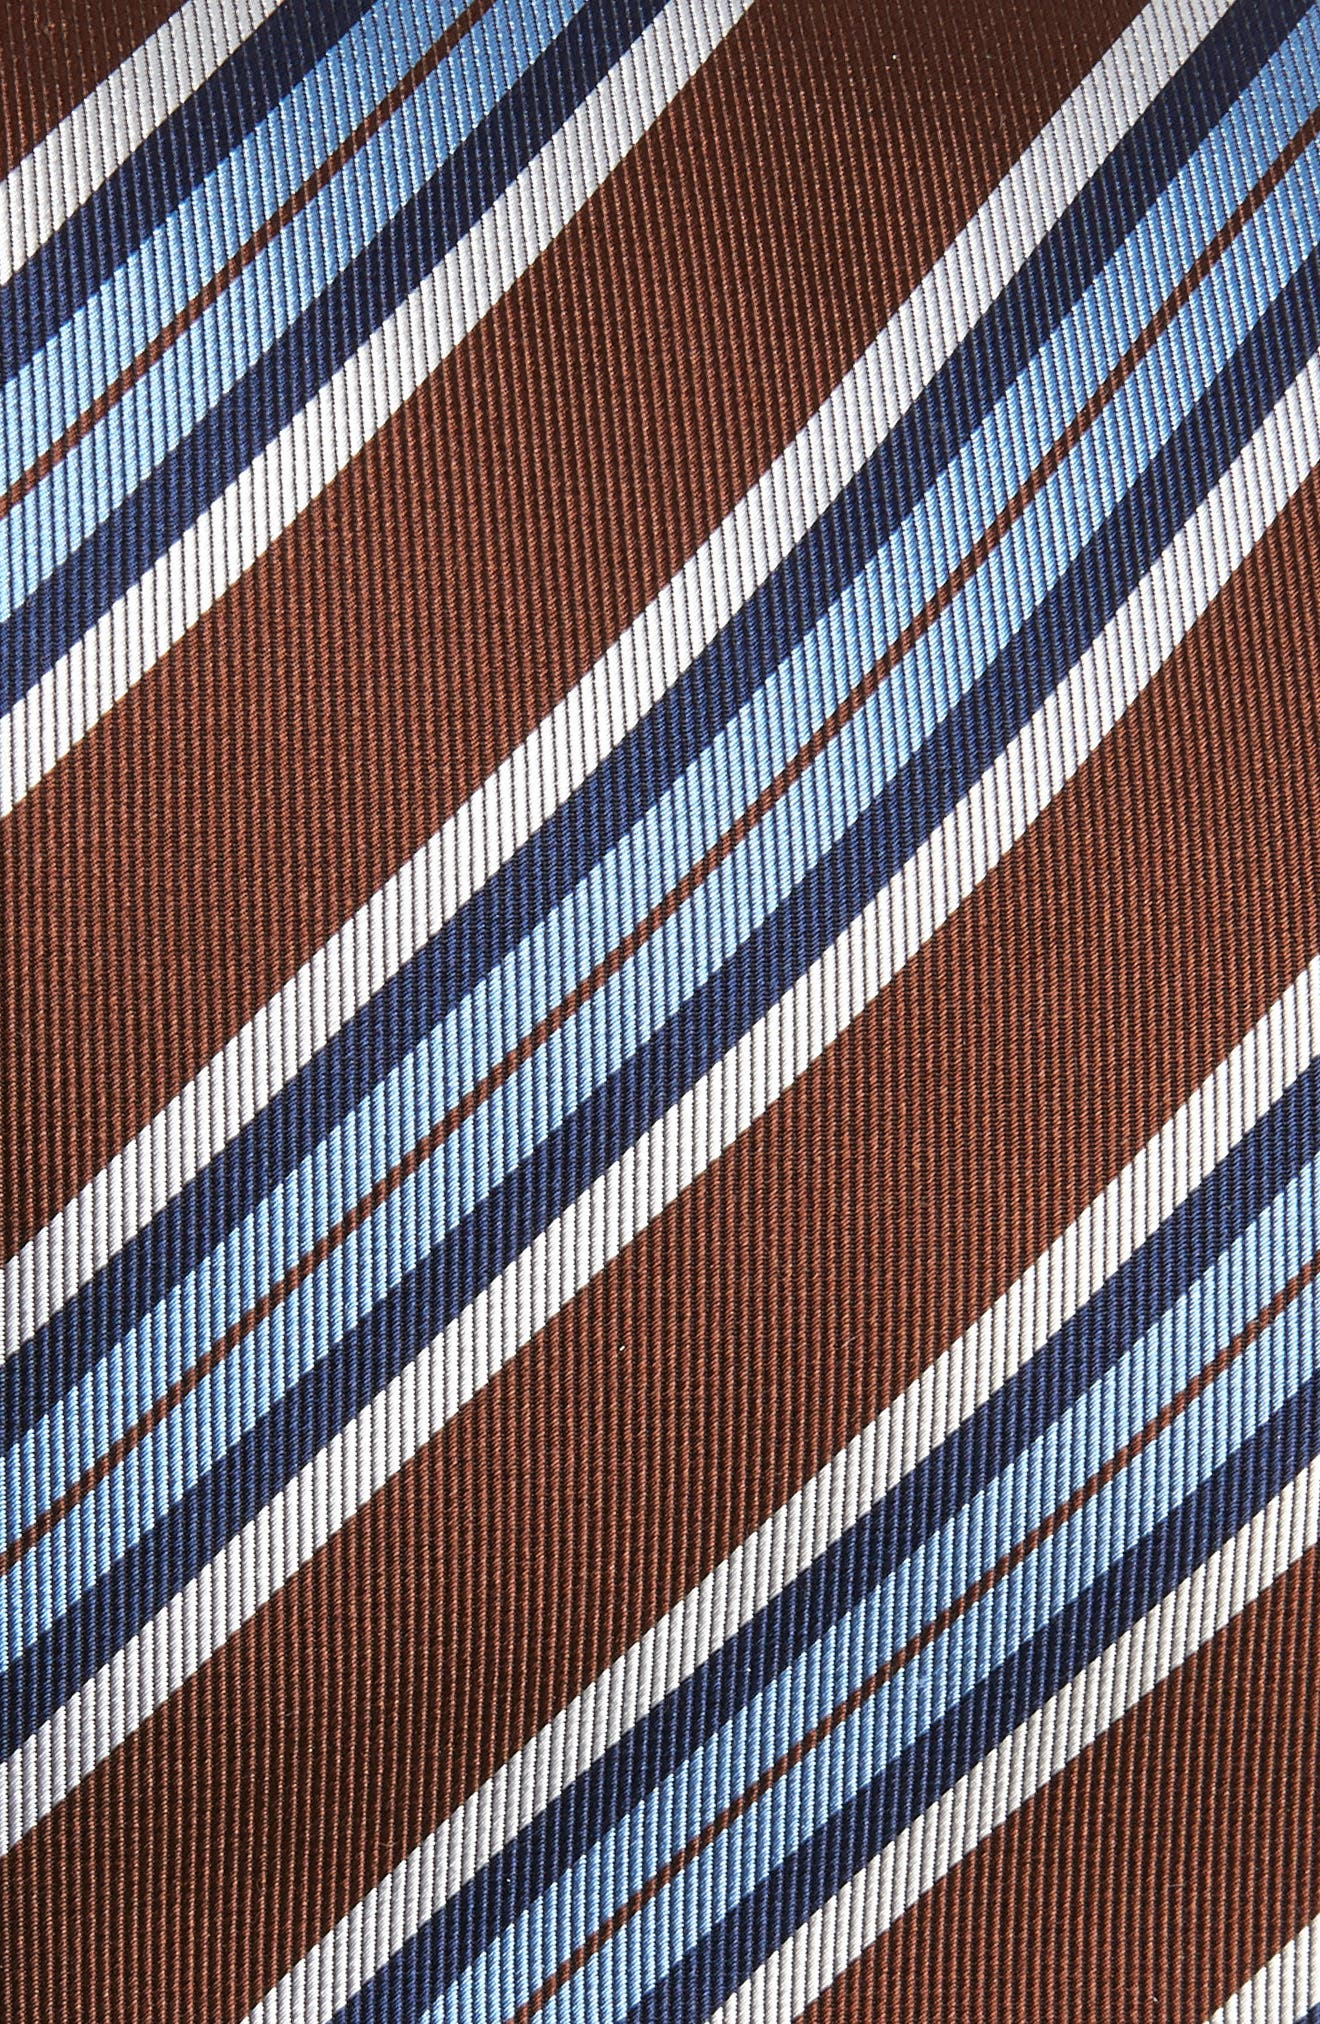 Stripe Silk X-Long Tie,                             Alternate thumbnail 2, color,                             CHOCOLATE